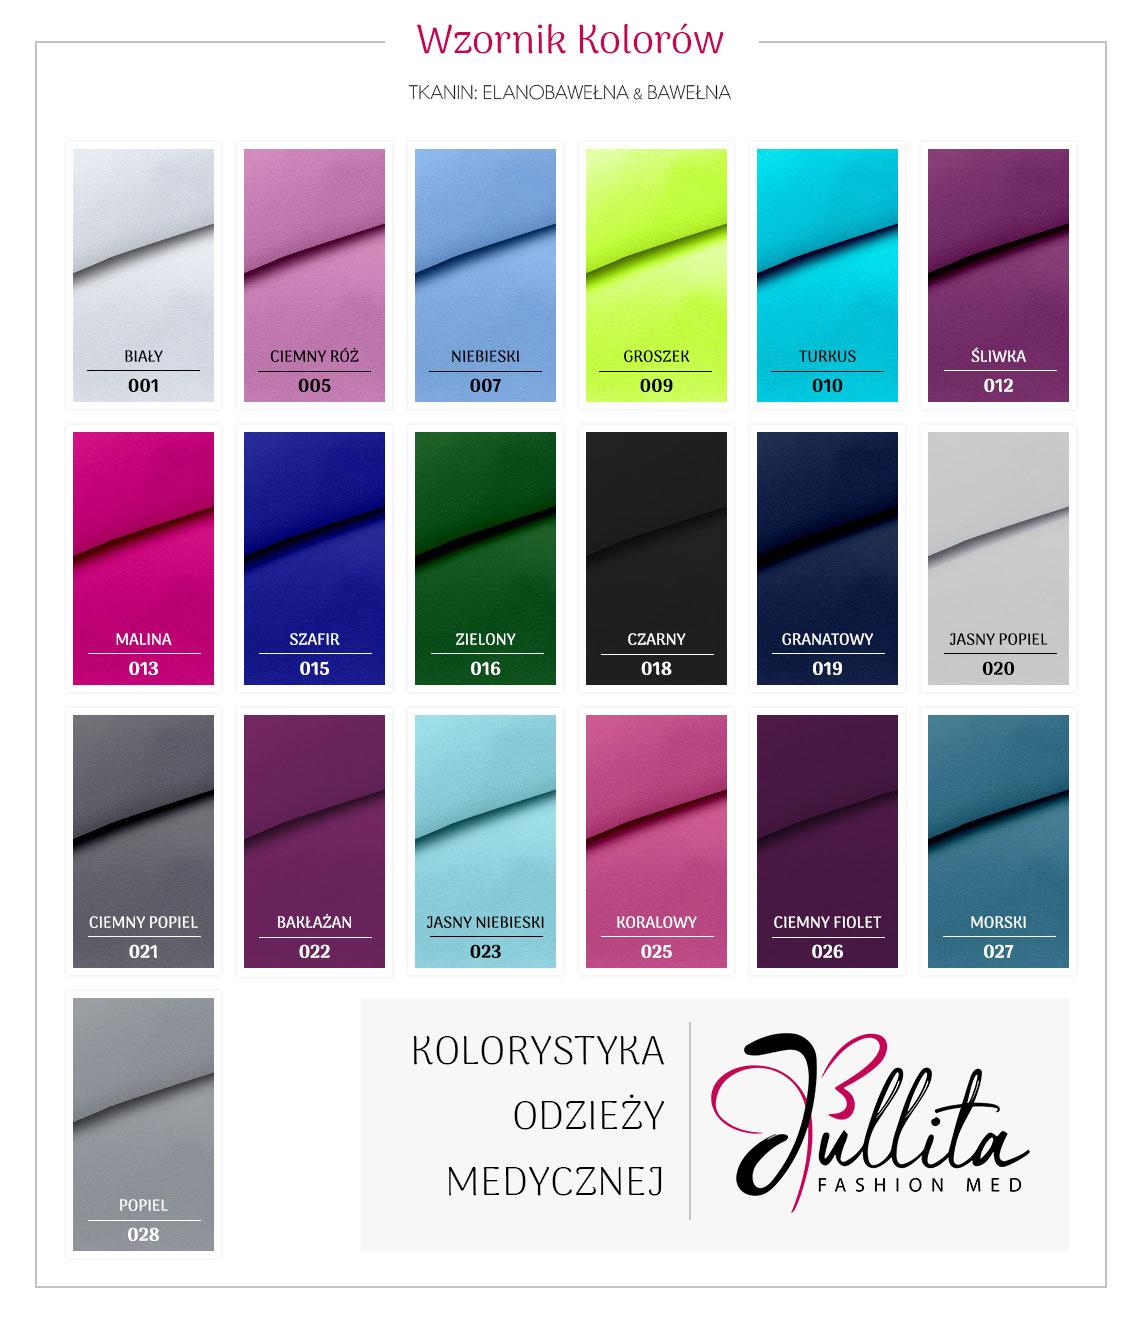 wzornik kolorow Jullita